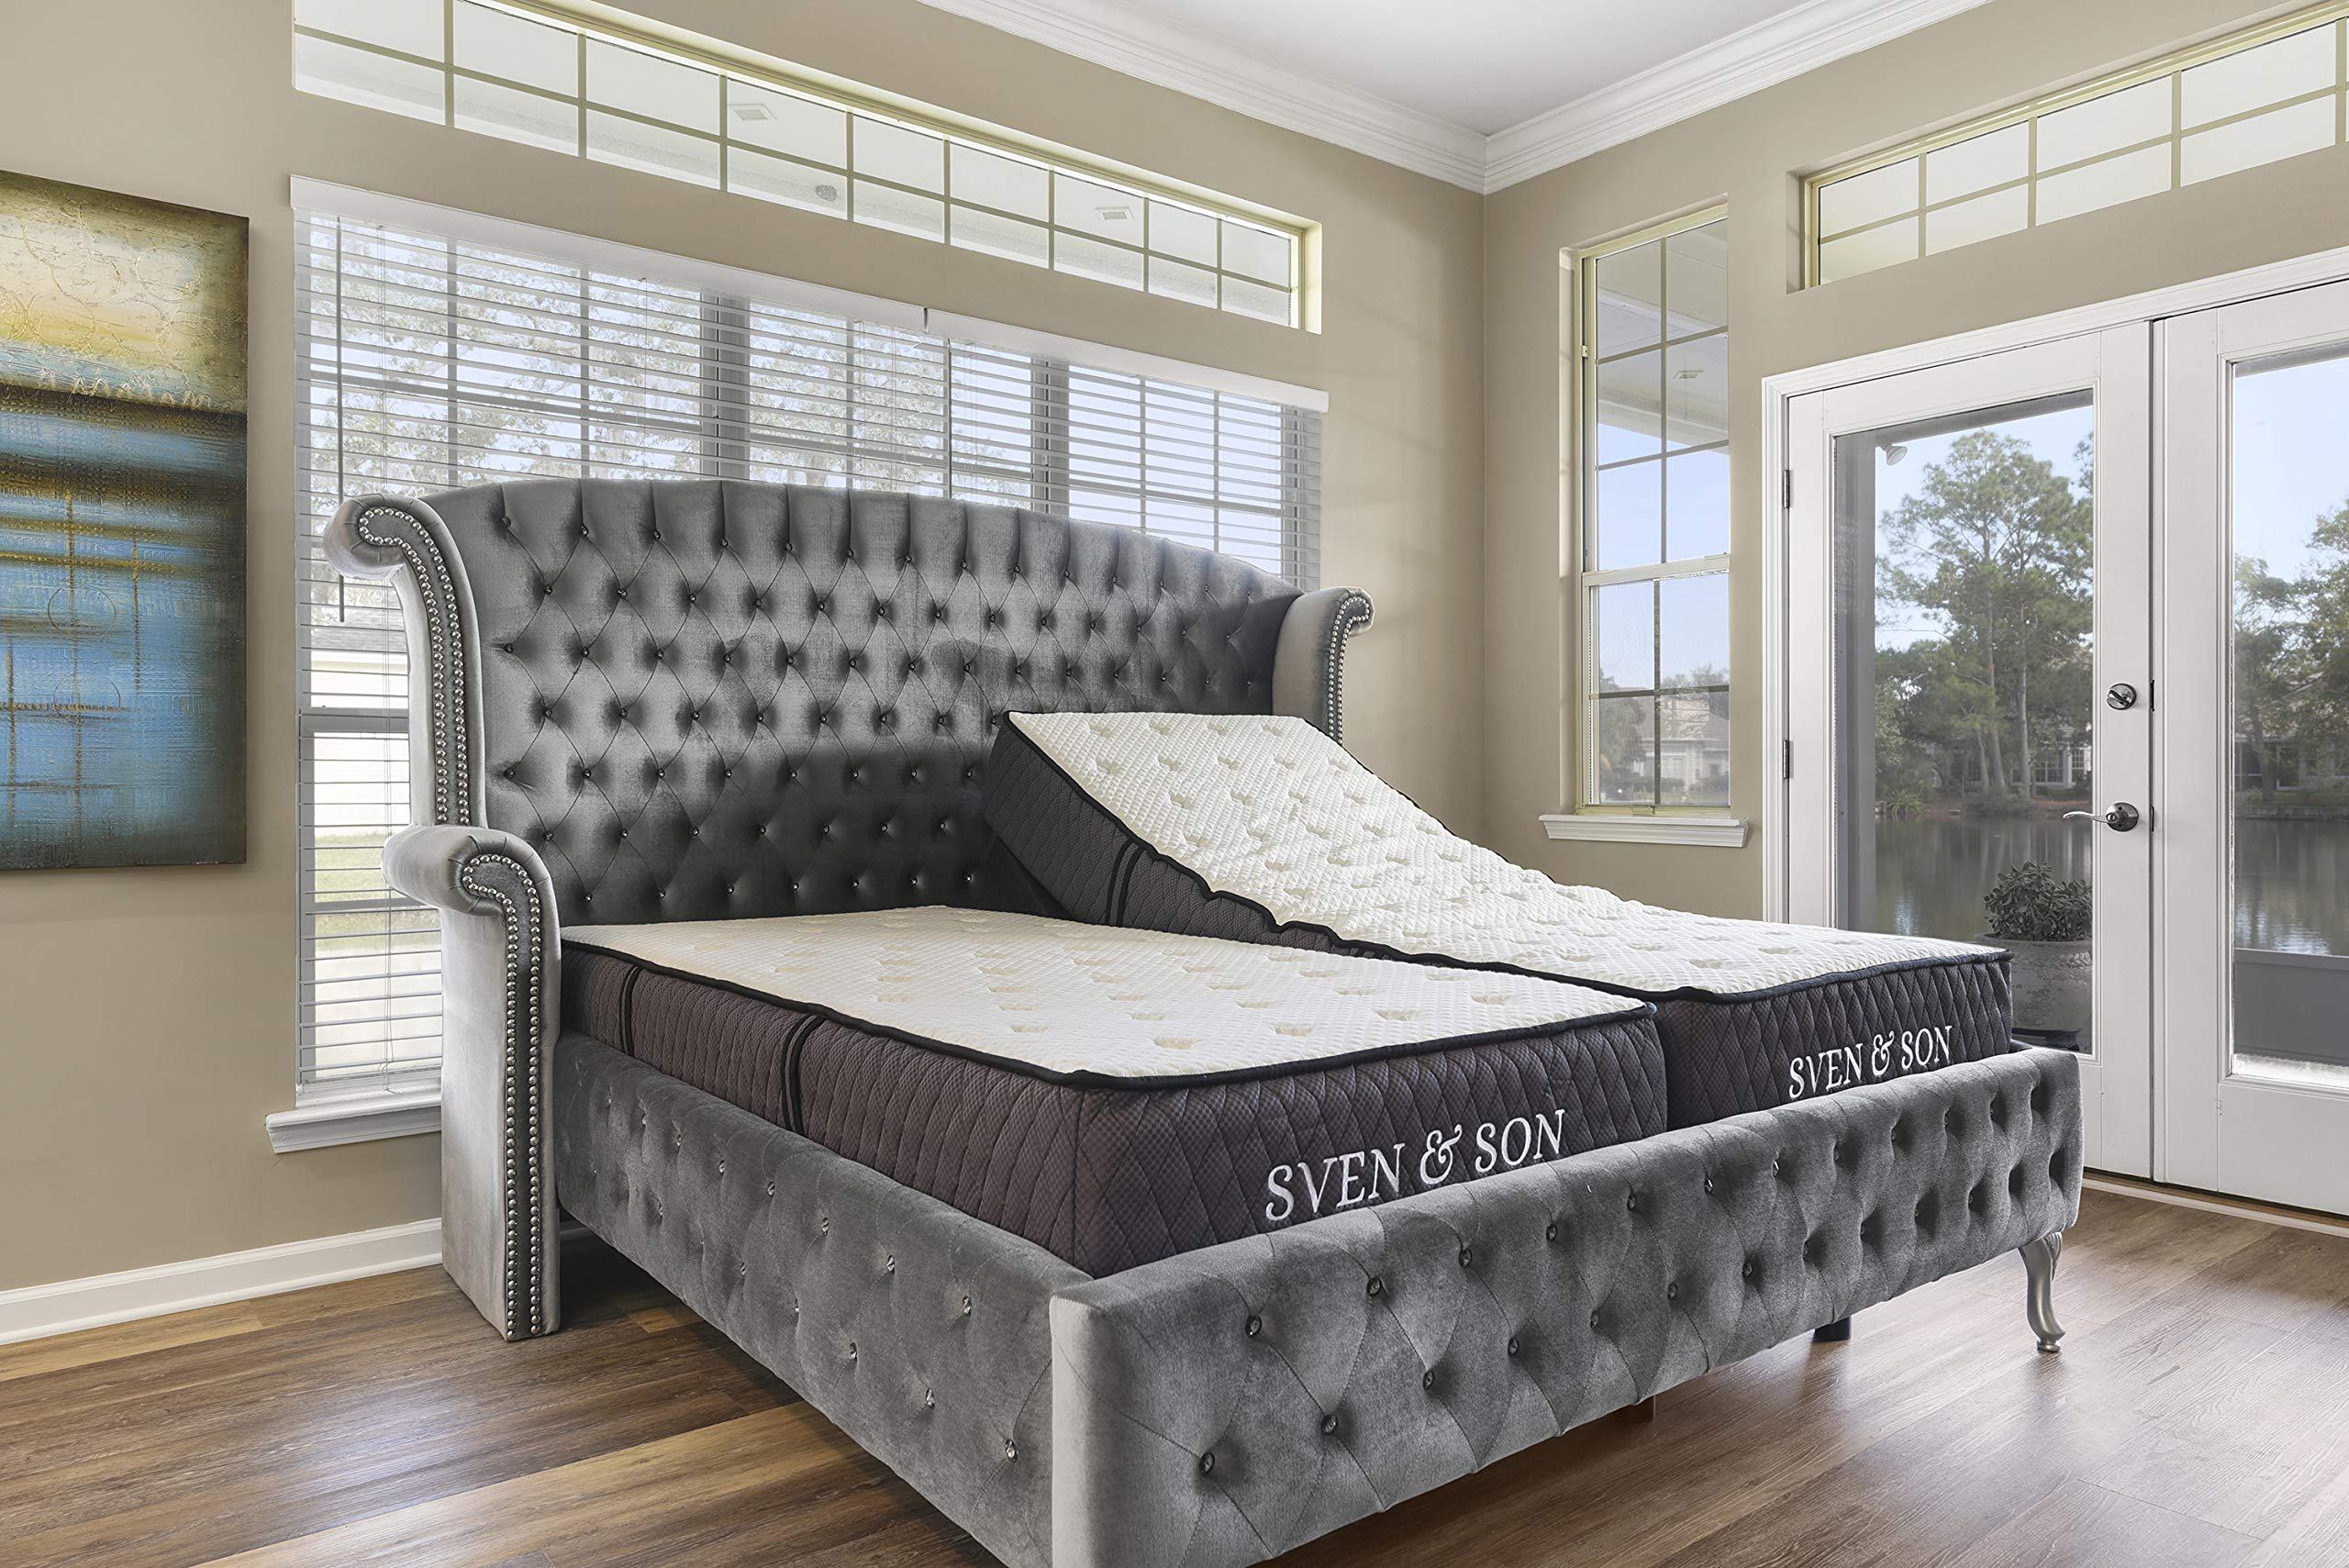 "Split King Adjustable Bed Frame Base + 12"" Luxury Cool Gel Memory Foam Mattress, Head Up Foot Up, USB Ports, Zero Gravity, Interactive Dual Massage, Wireless, Classic by Sven & Son (Split King)"